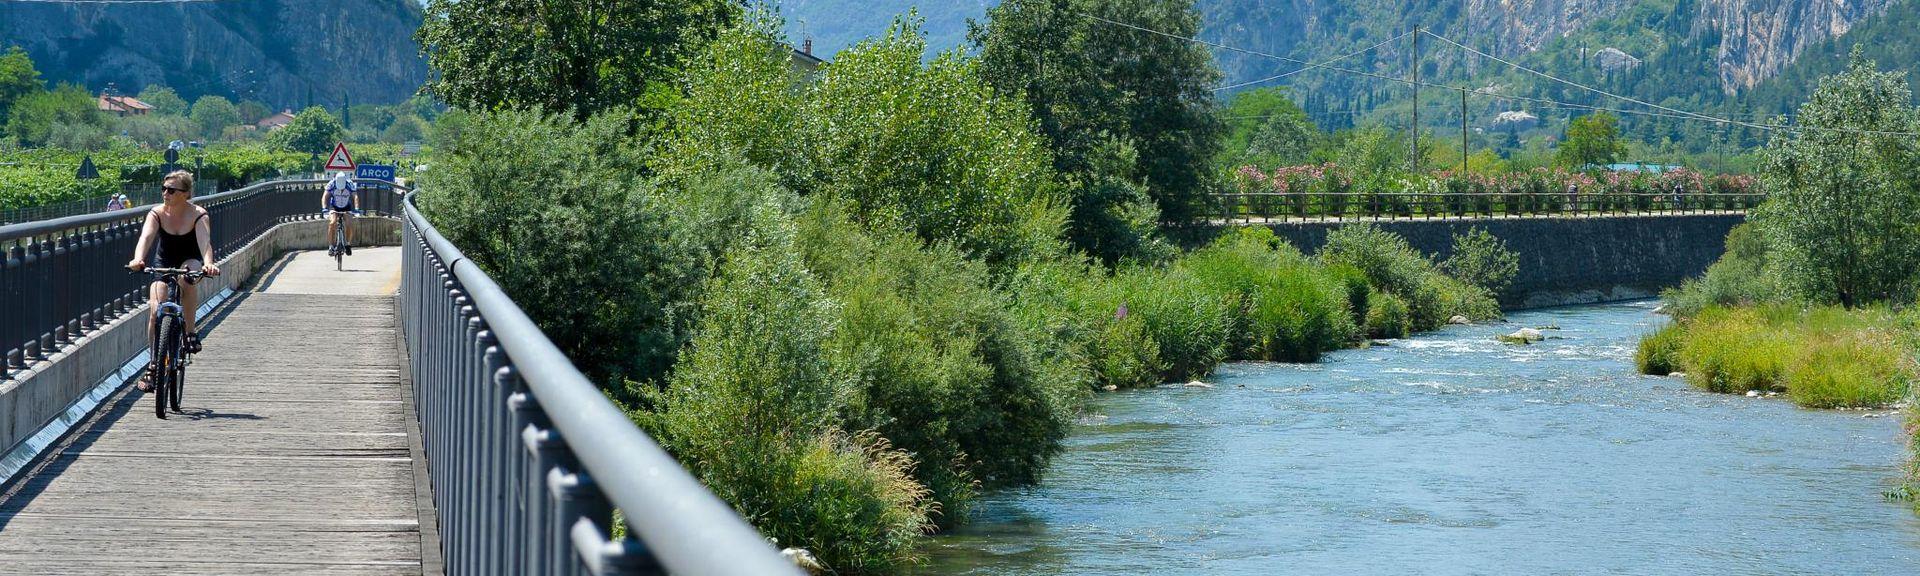 Lagolo, Trentino-Alto Adige, Itália